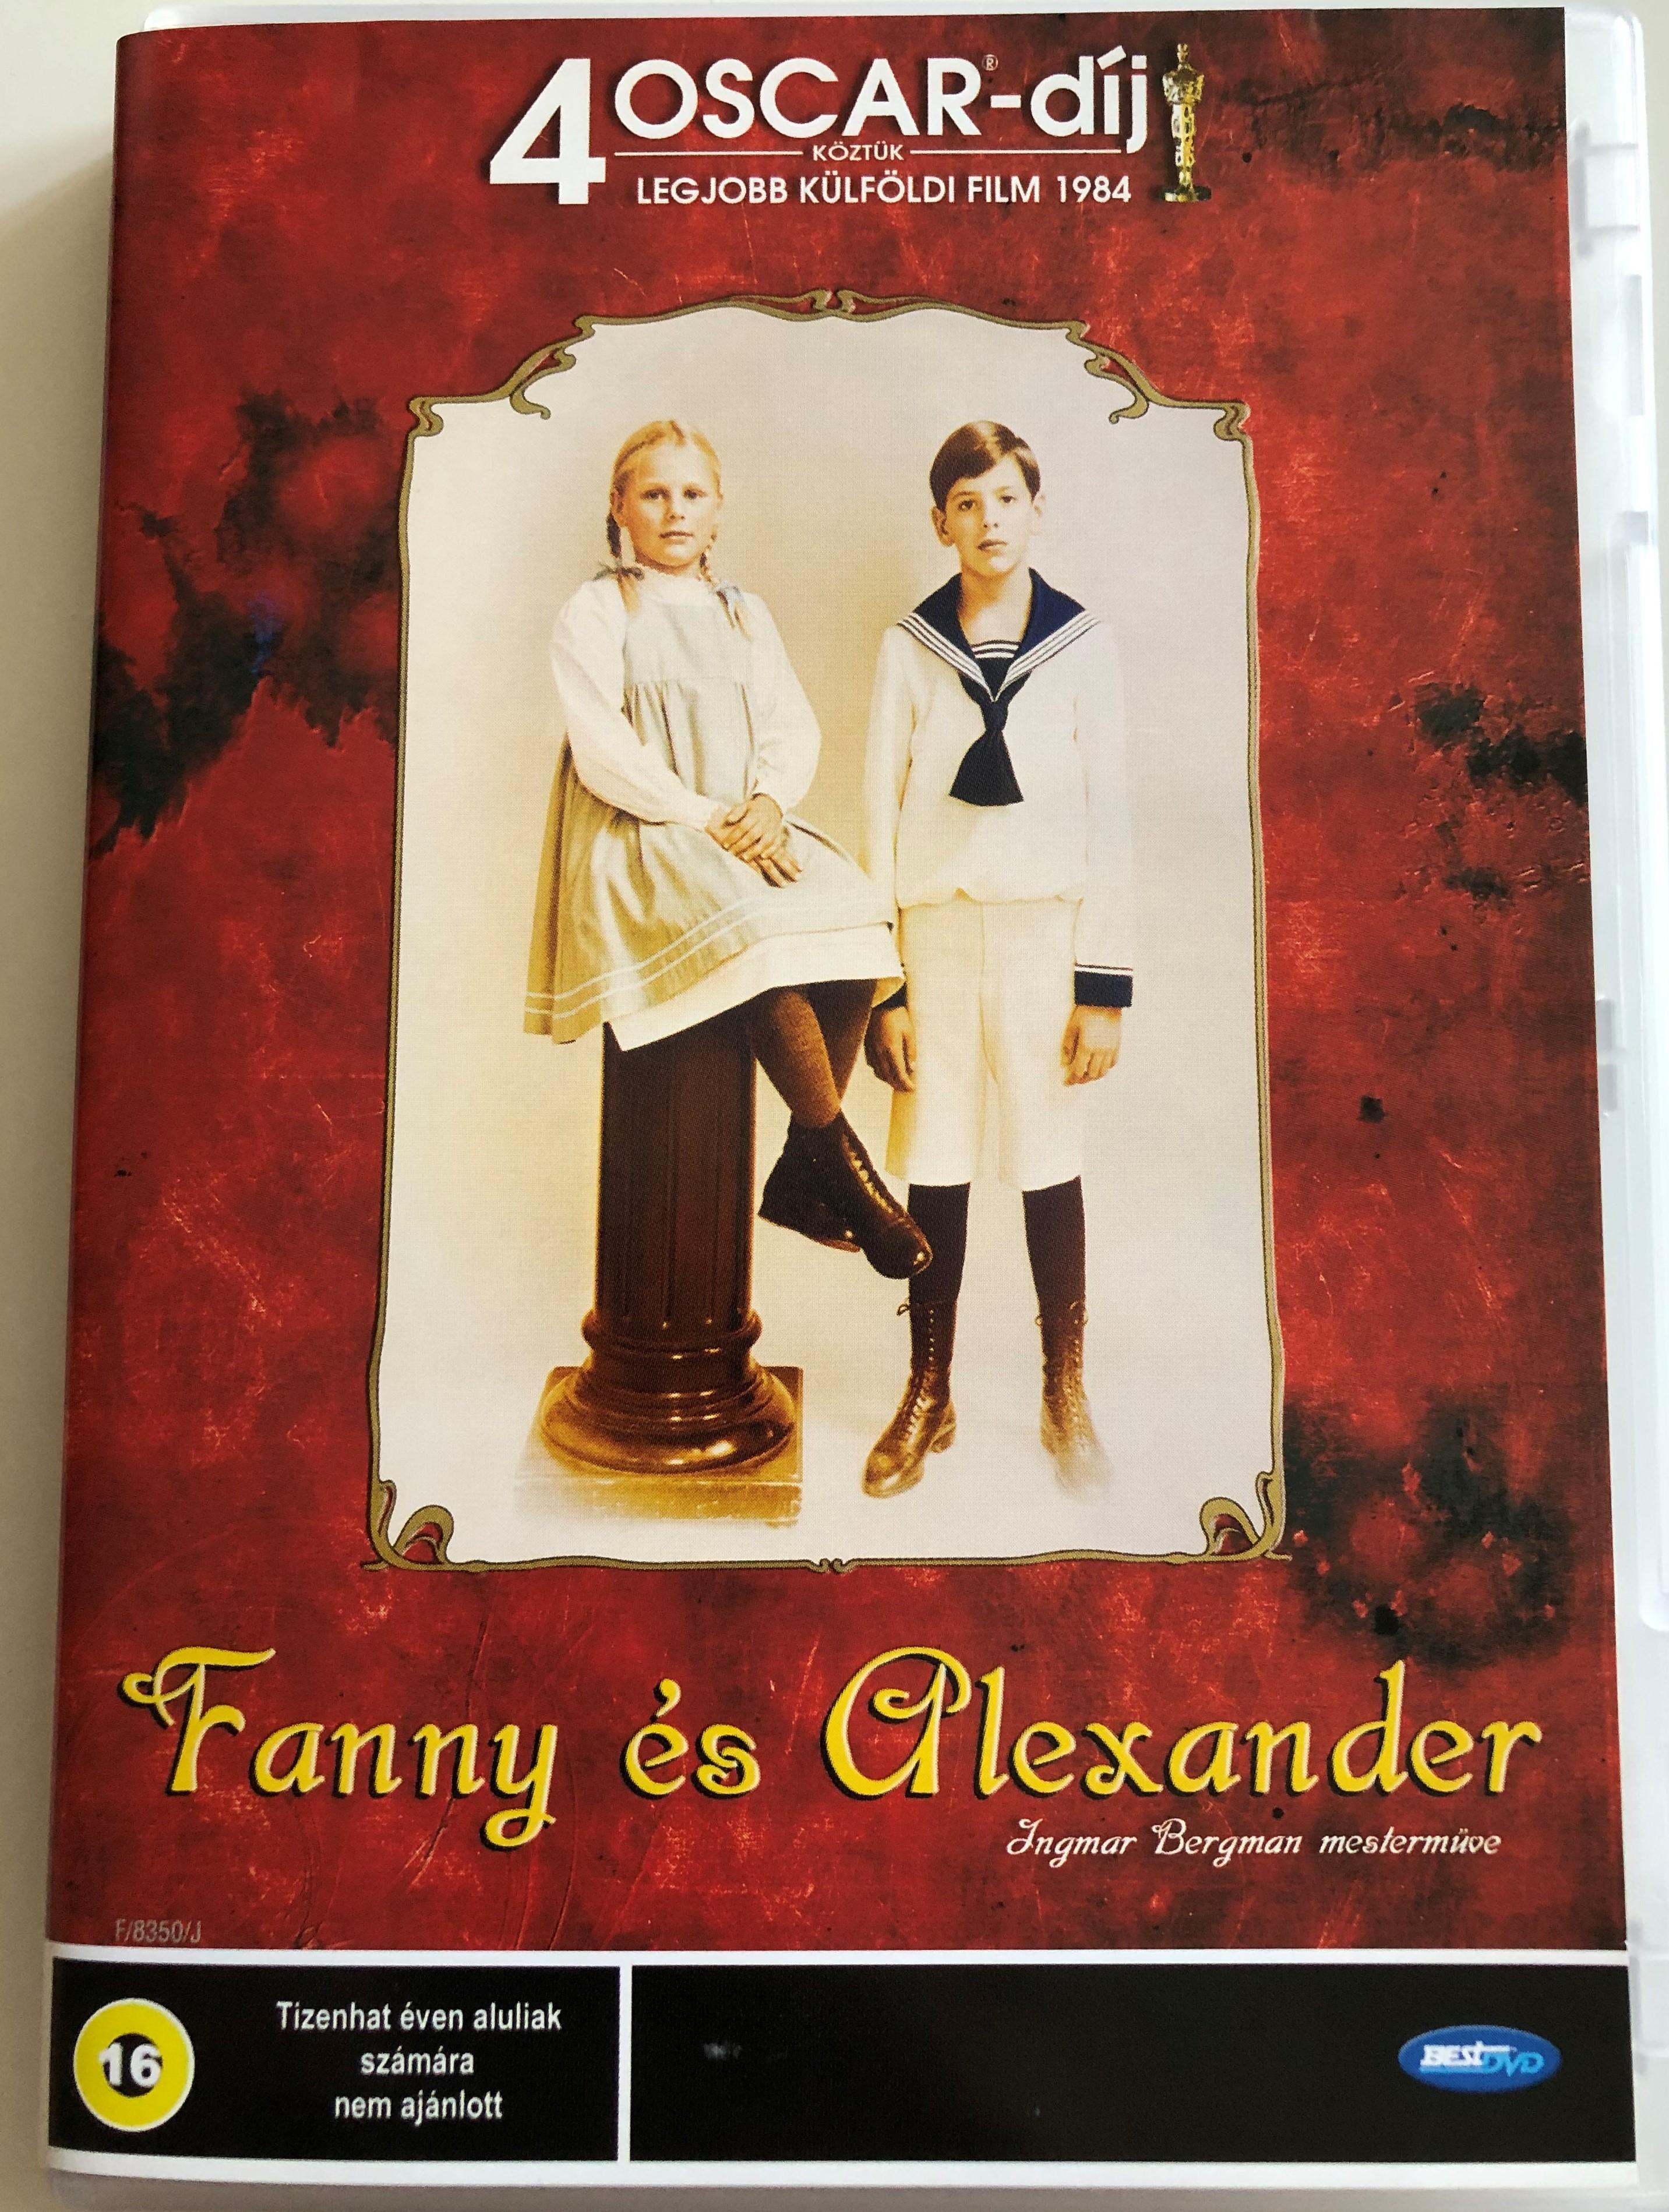 fanny-s-alexander-dvd-1982-fanny-och-alexander-ingmar-bergman-s-masterpiece-directed-by-ingmar-bergman-starring-pernilla-allwin-bertil-guve-jan-malmsj-b-rje-ahlstedt-anna-bergman-1-.jpg